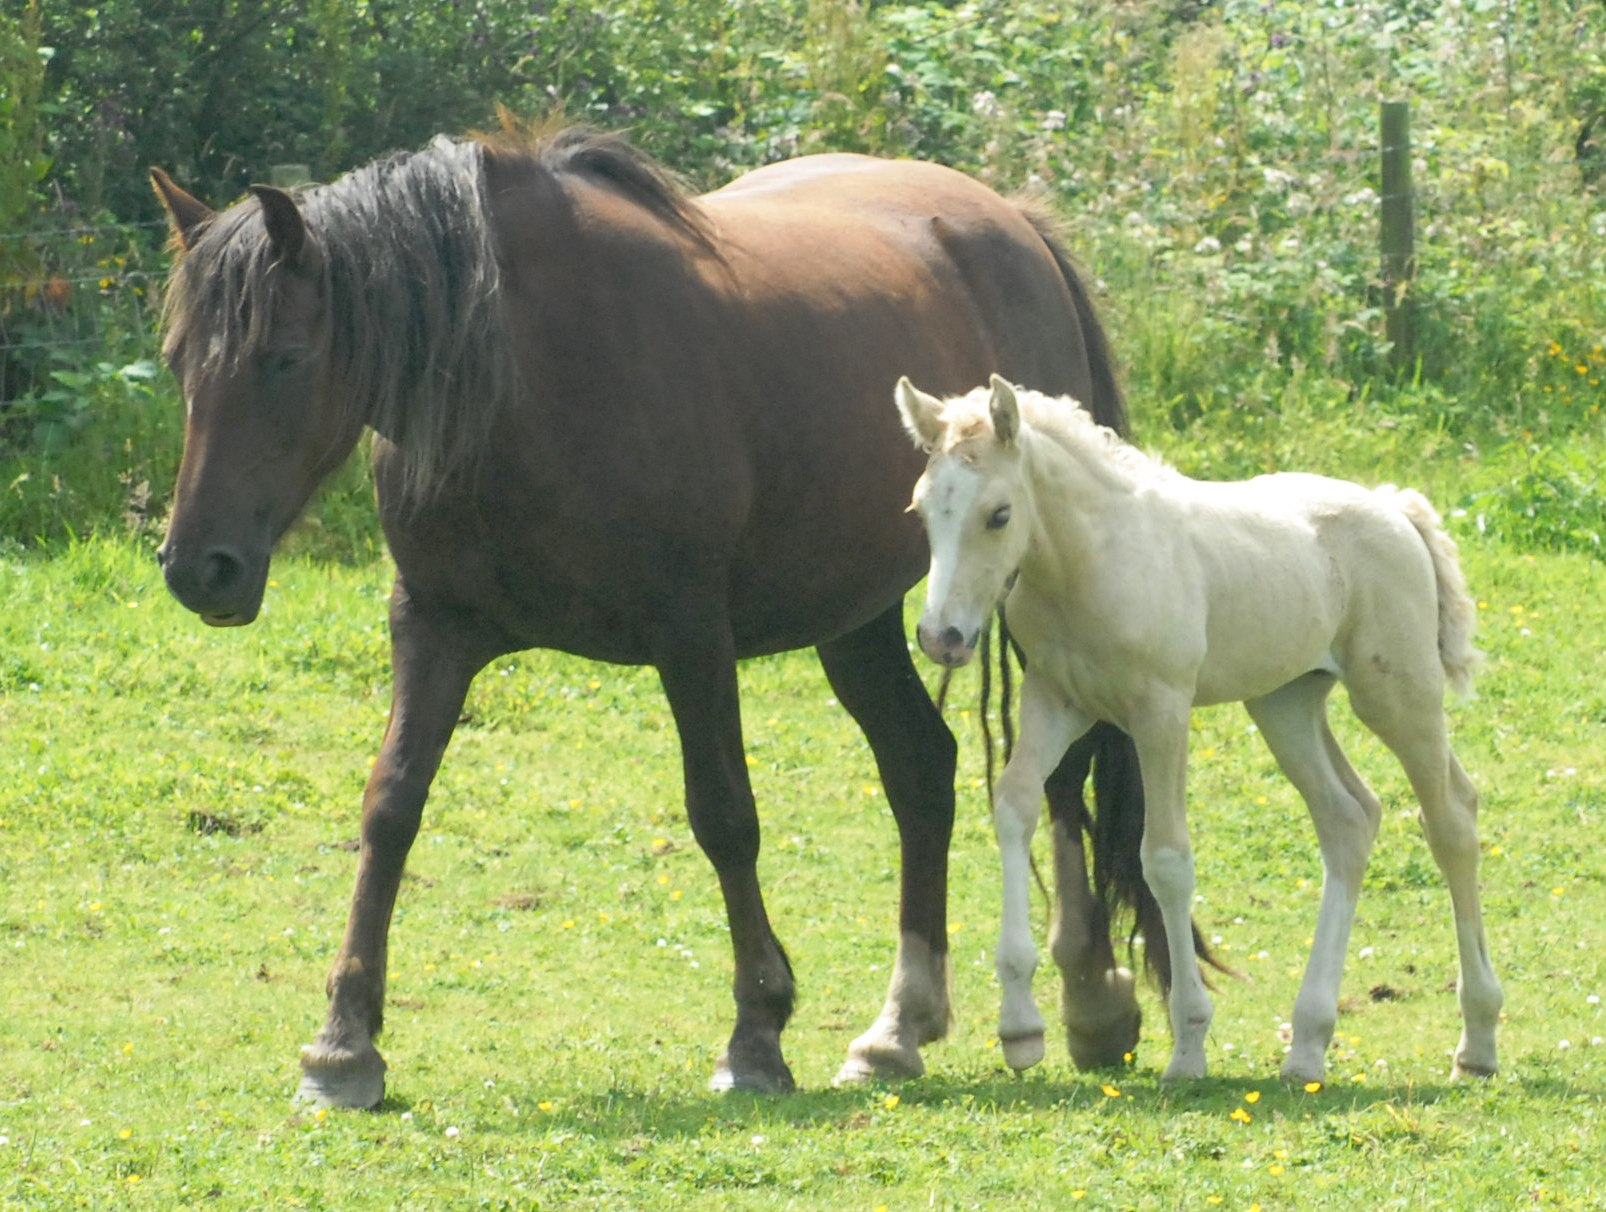 palomino foal - photo #22